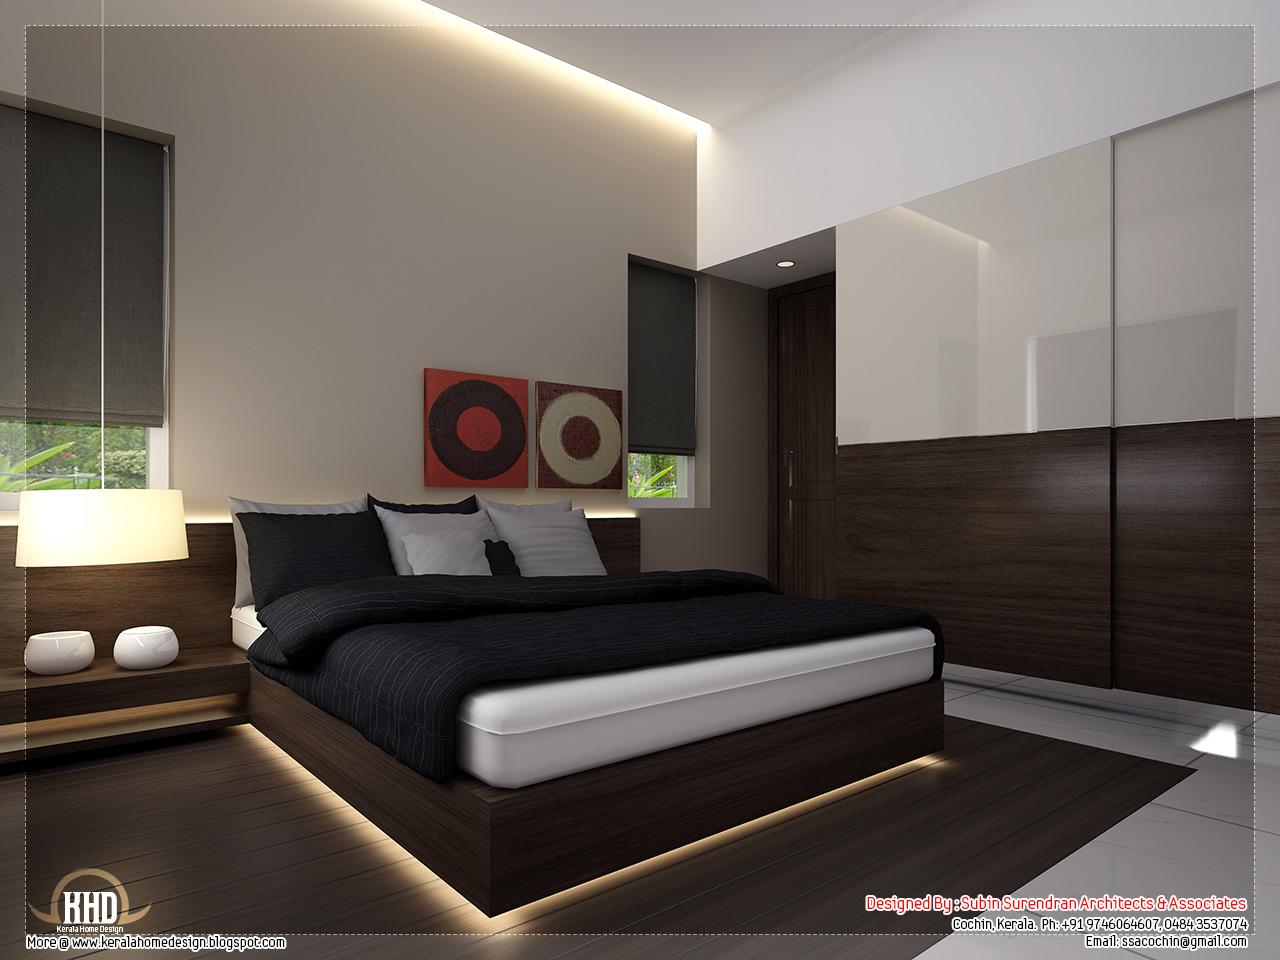 Simple Home Interior Design Bedroom 1280x960 Wallpaper Teahub Io